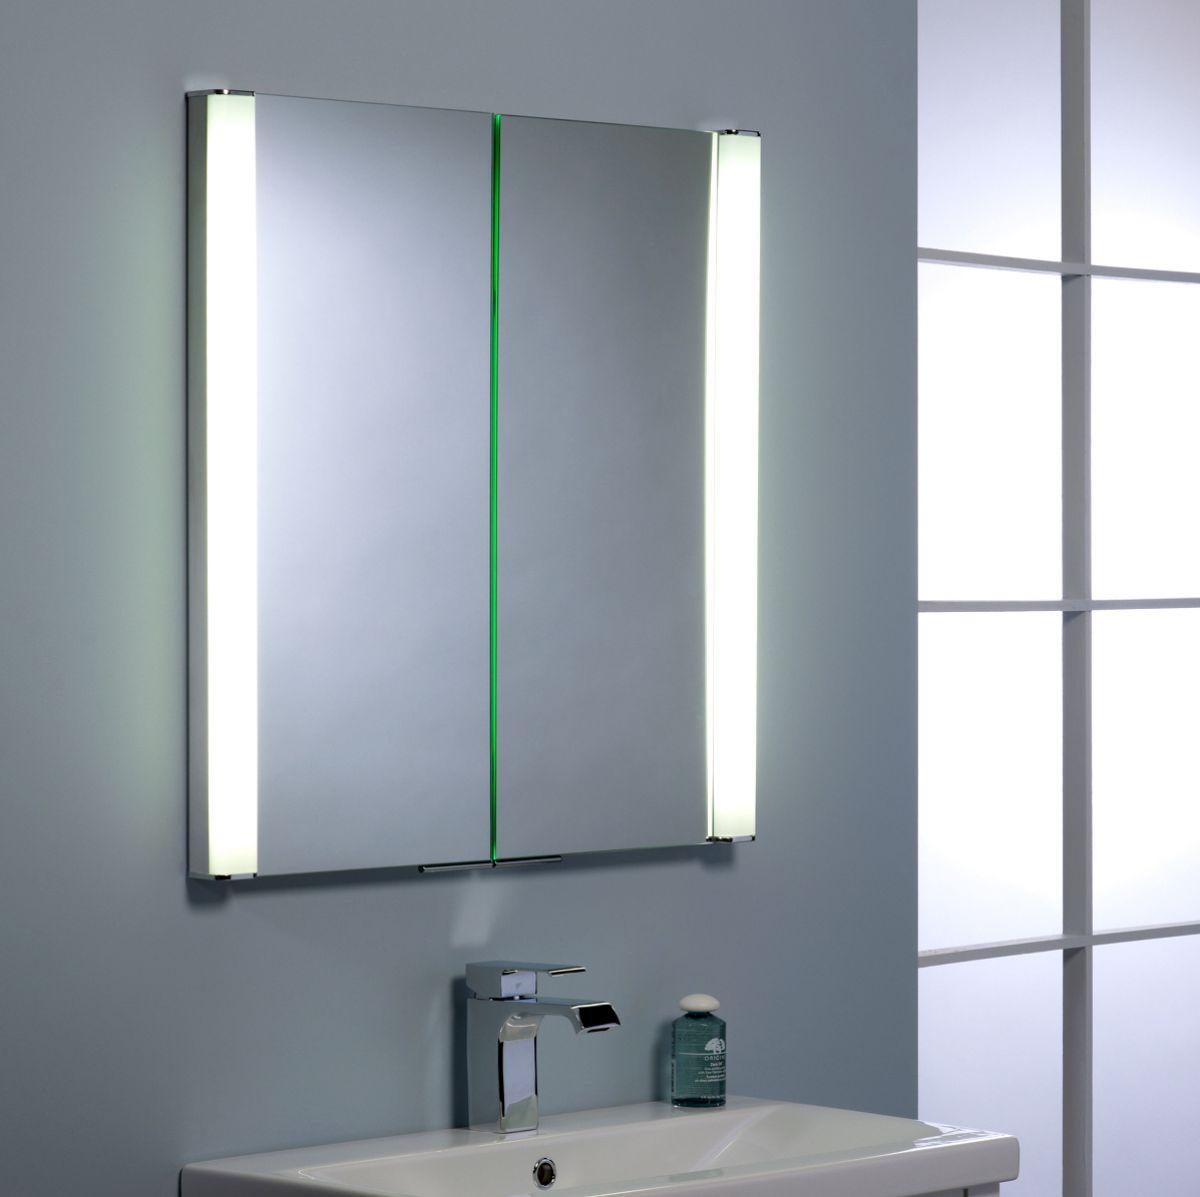 Aluminium Bathroom Cabinets Roper Rhodes Transition Illuminated Recessible Cabinet Uk Bathrooms